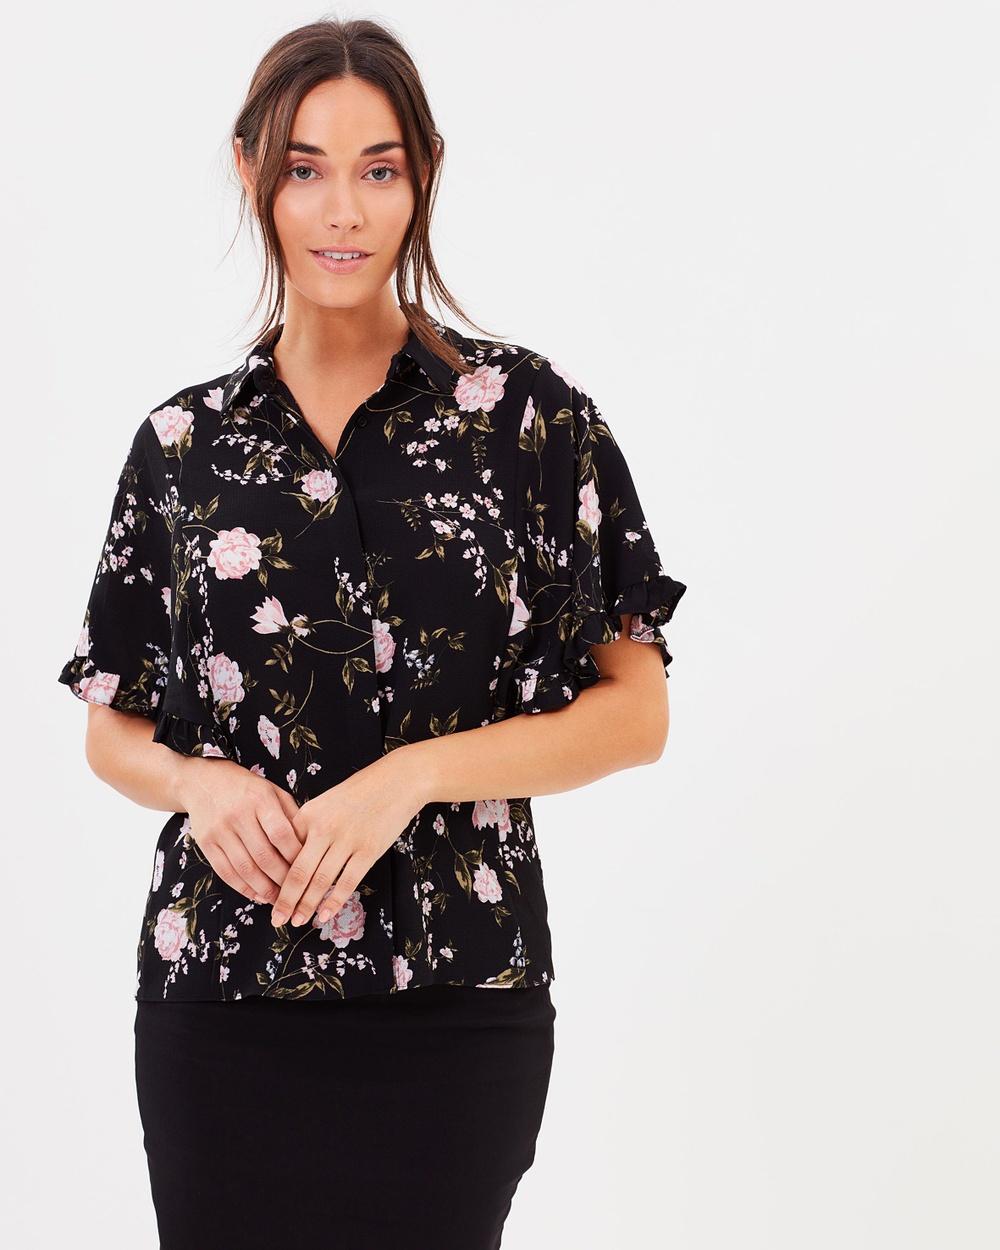 Dorothy Perkins Floral Print Ruffle Shirt Tops Black Floral Print Ruffle Shirt